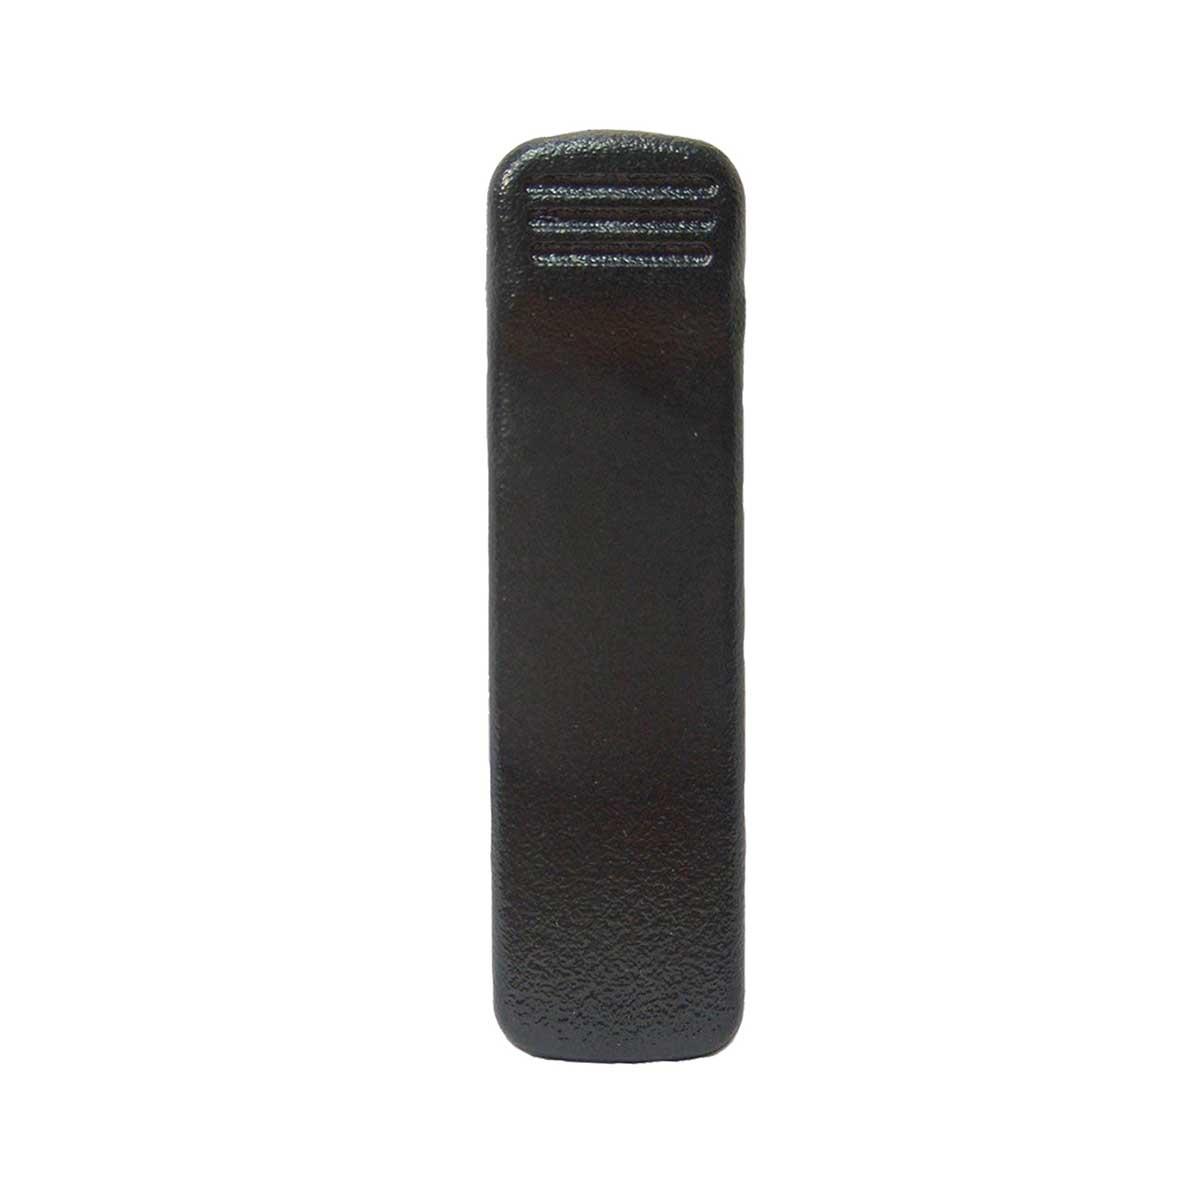 Clip para radio Motorola HLN8255